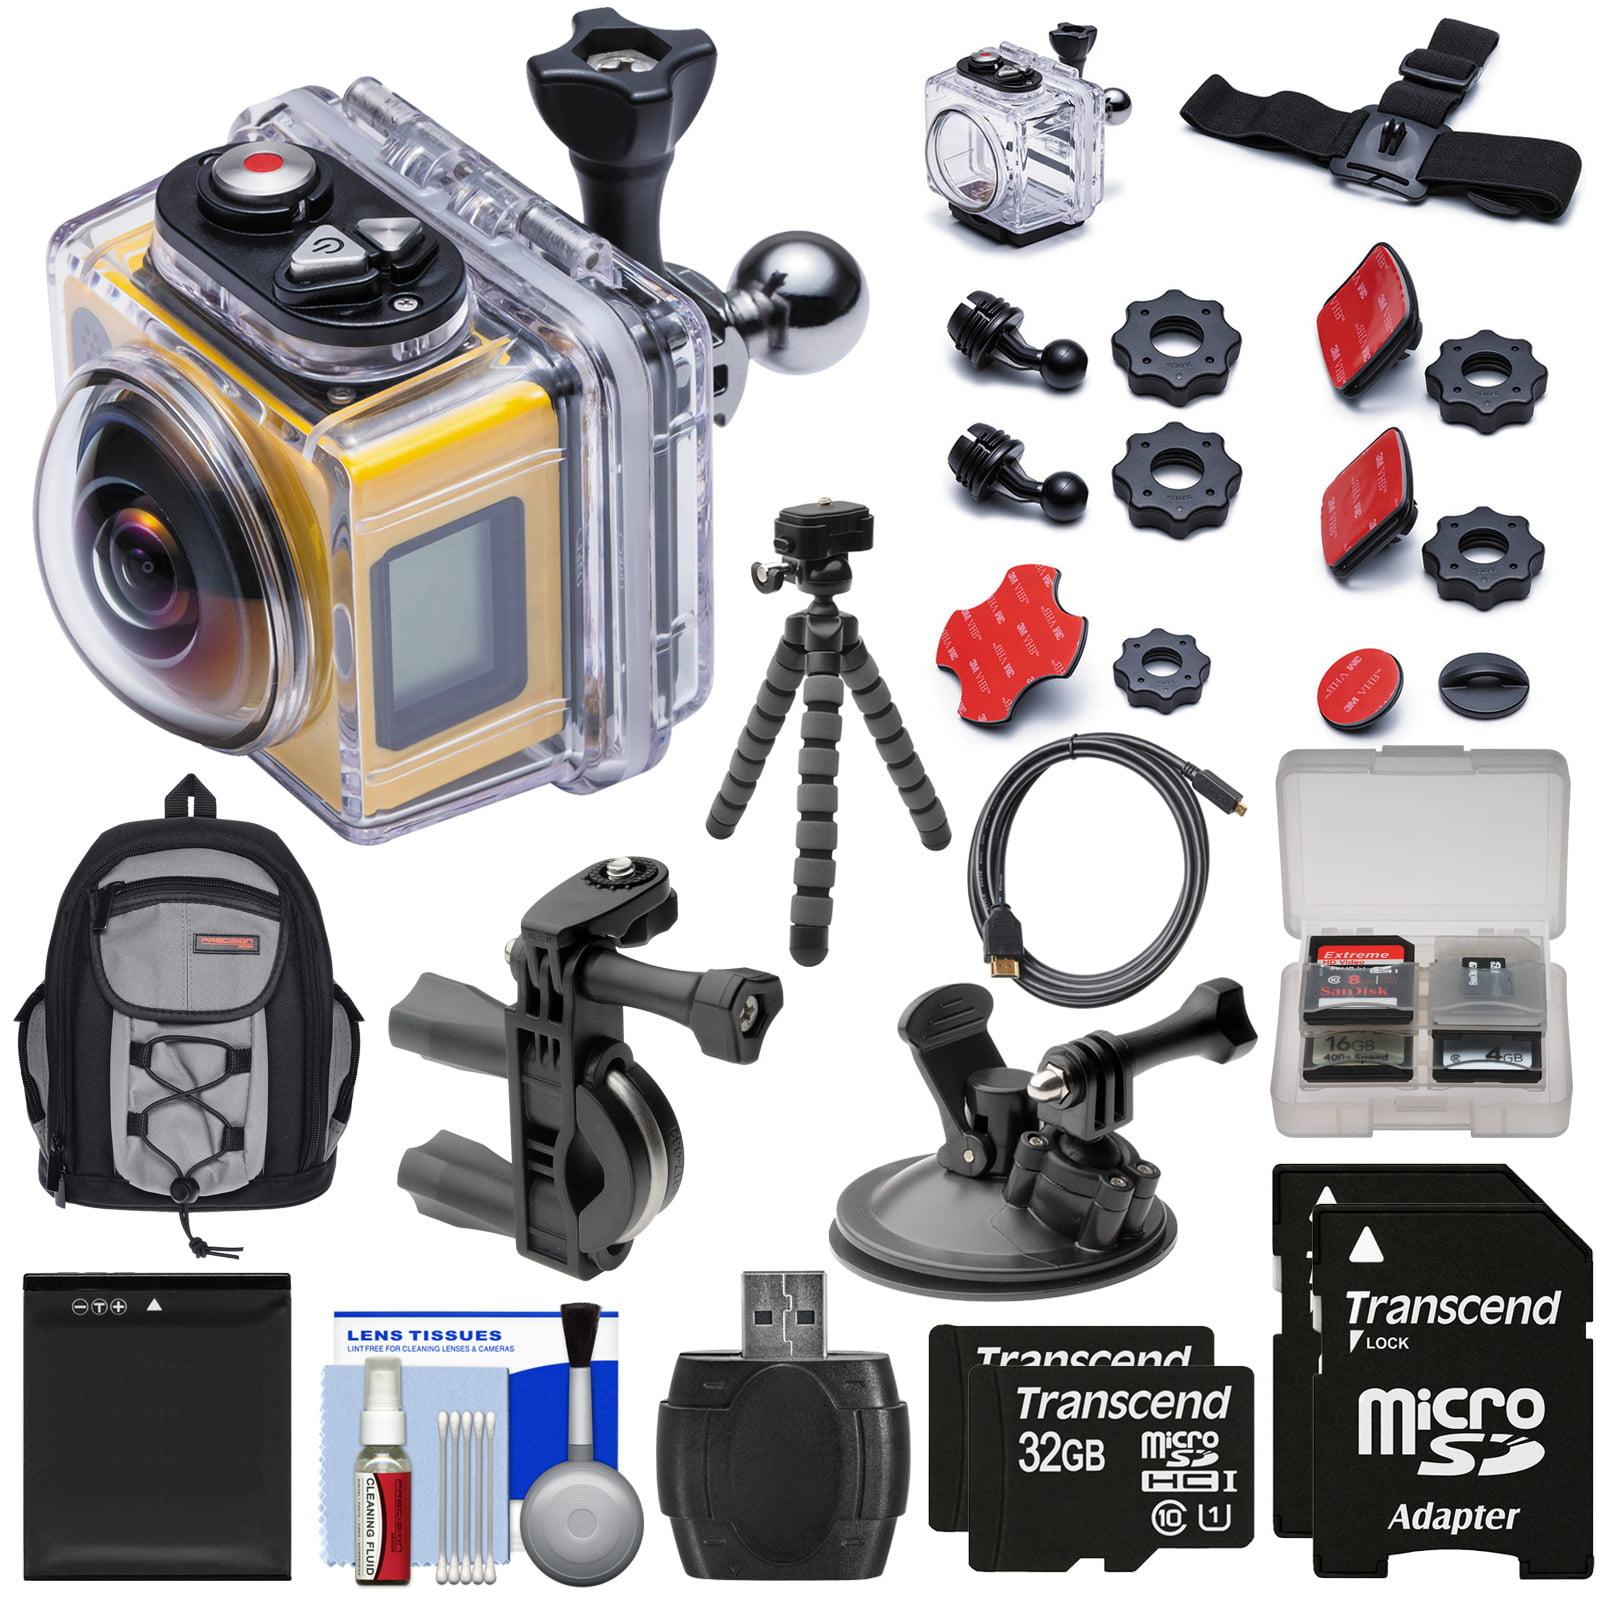 Kodak PixPro SP360 Wi-Fi HD Video Action Camera Camcorder - Aqua Sport Pack + Bike & Suction Cup Mounts + 64GBs + Battery + Backpack + Tripod Kit